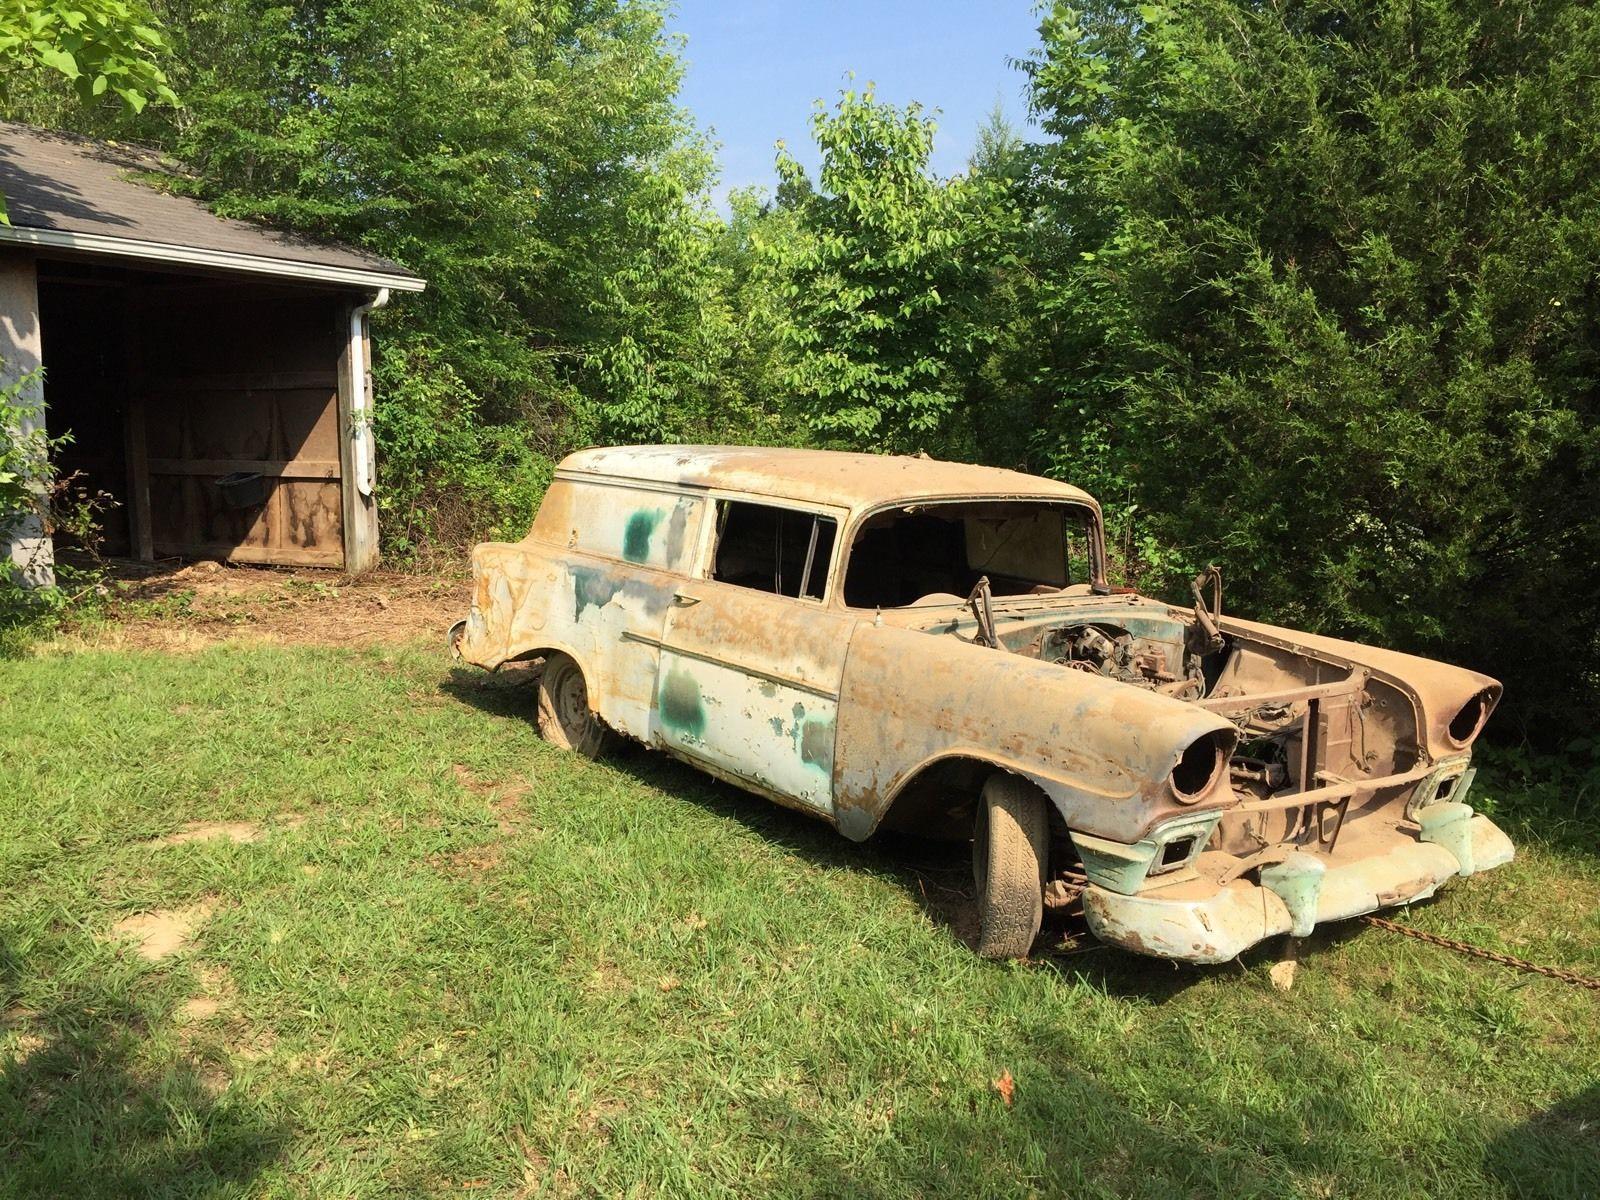 56 Chevy 2 Door Sedan Delivery Car Project Needs Rat Hot Rod Parts ...